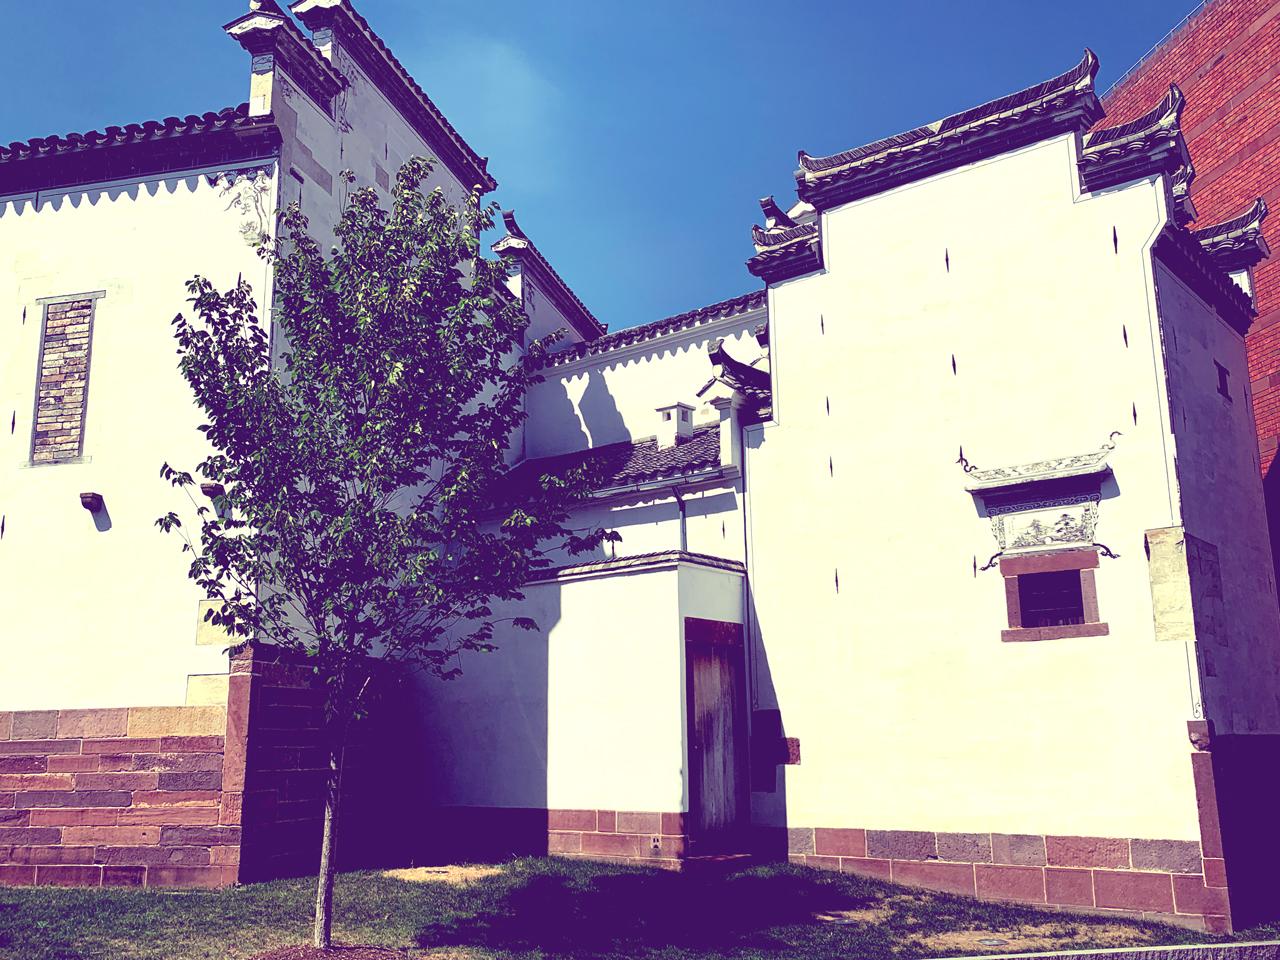 yu-tang-house-peabody-essex-museum-salem-massachusetts-1280x960-02